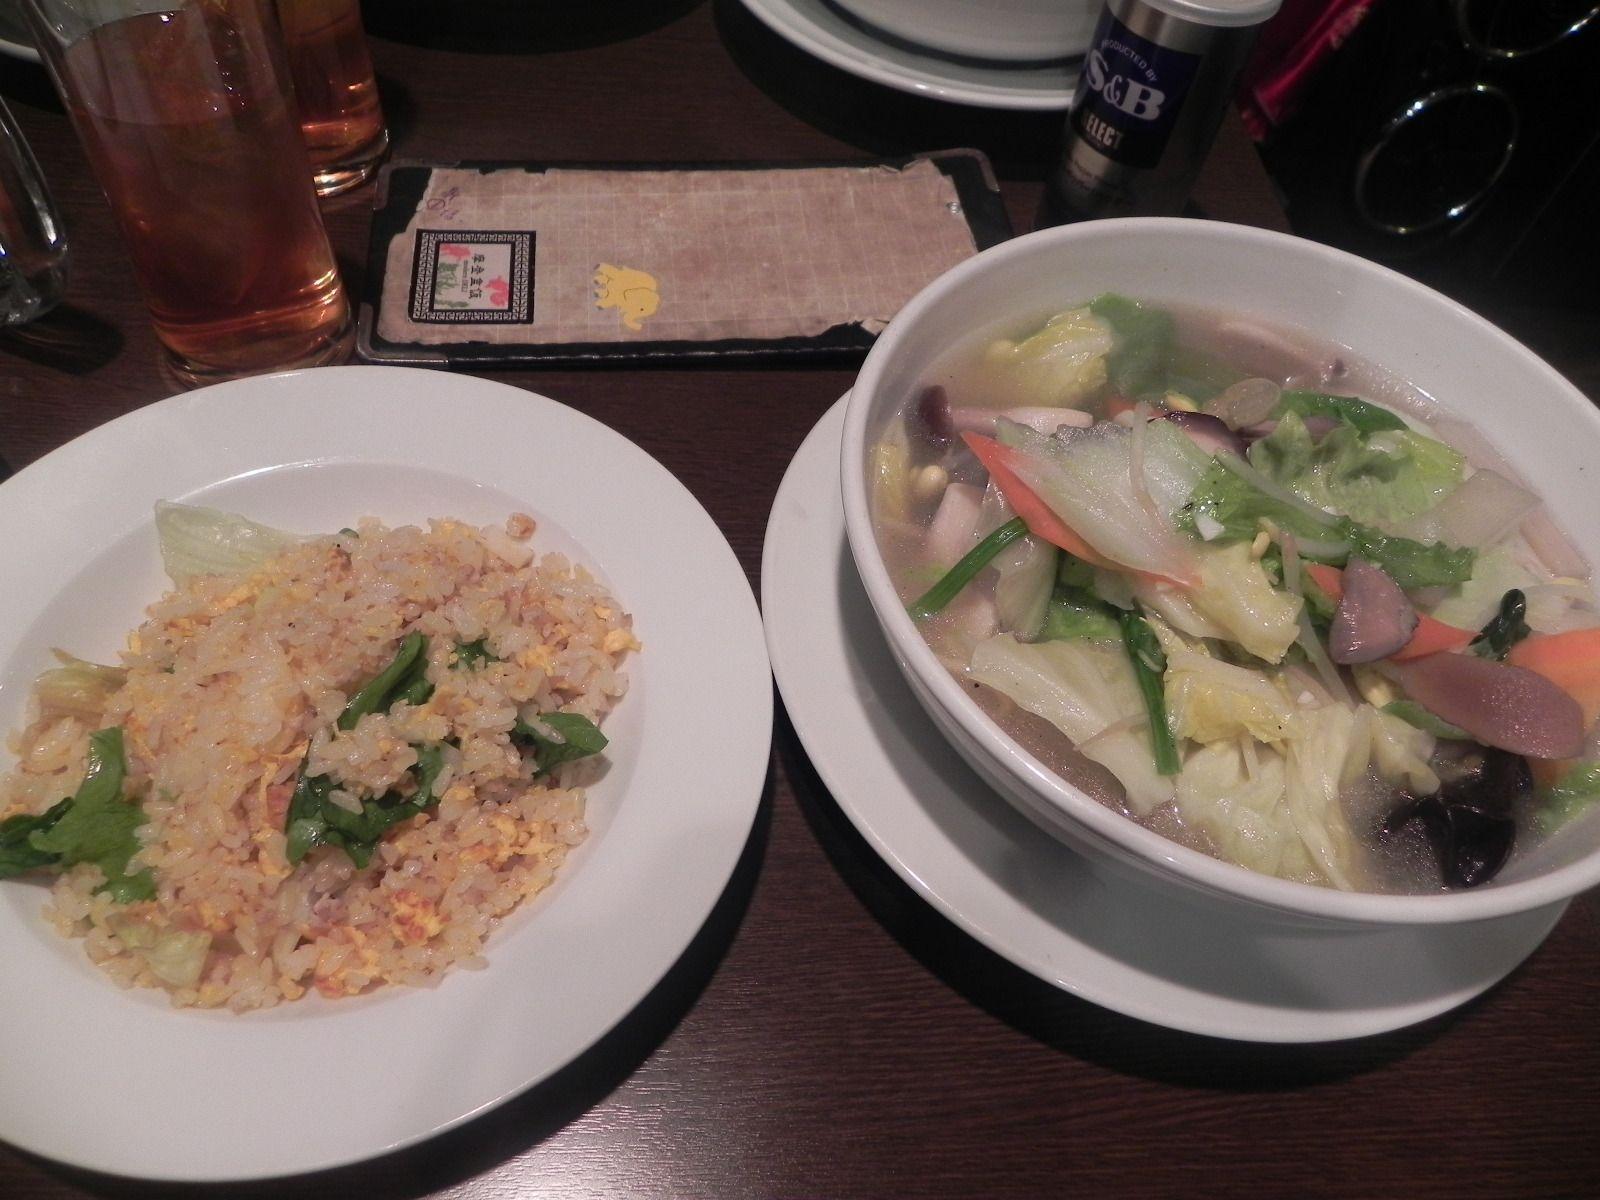 January 5th, 2014 980 yen